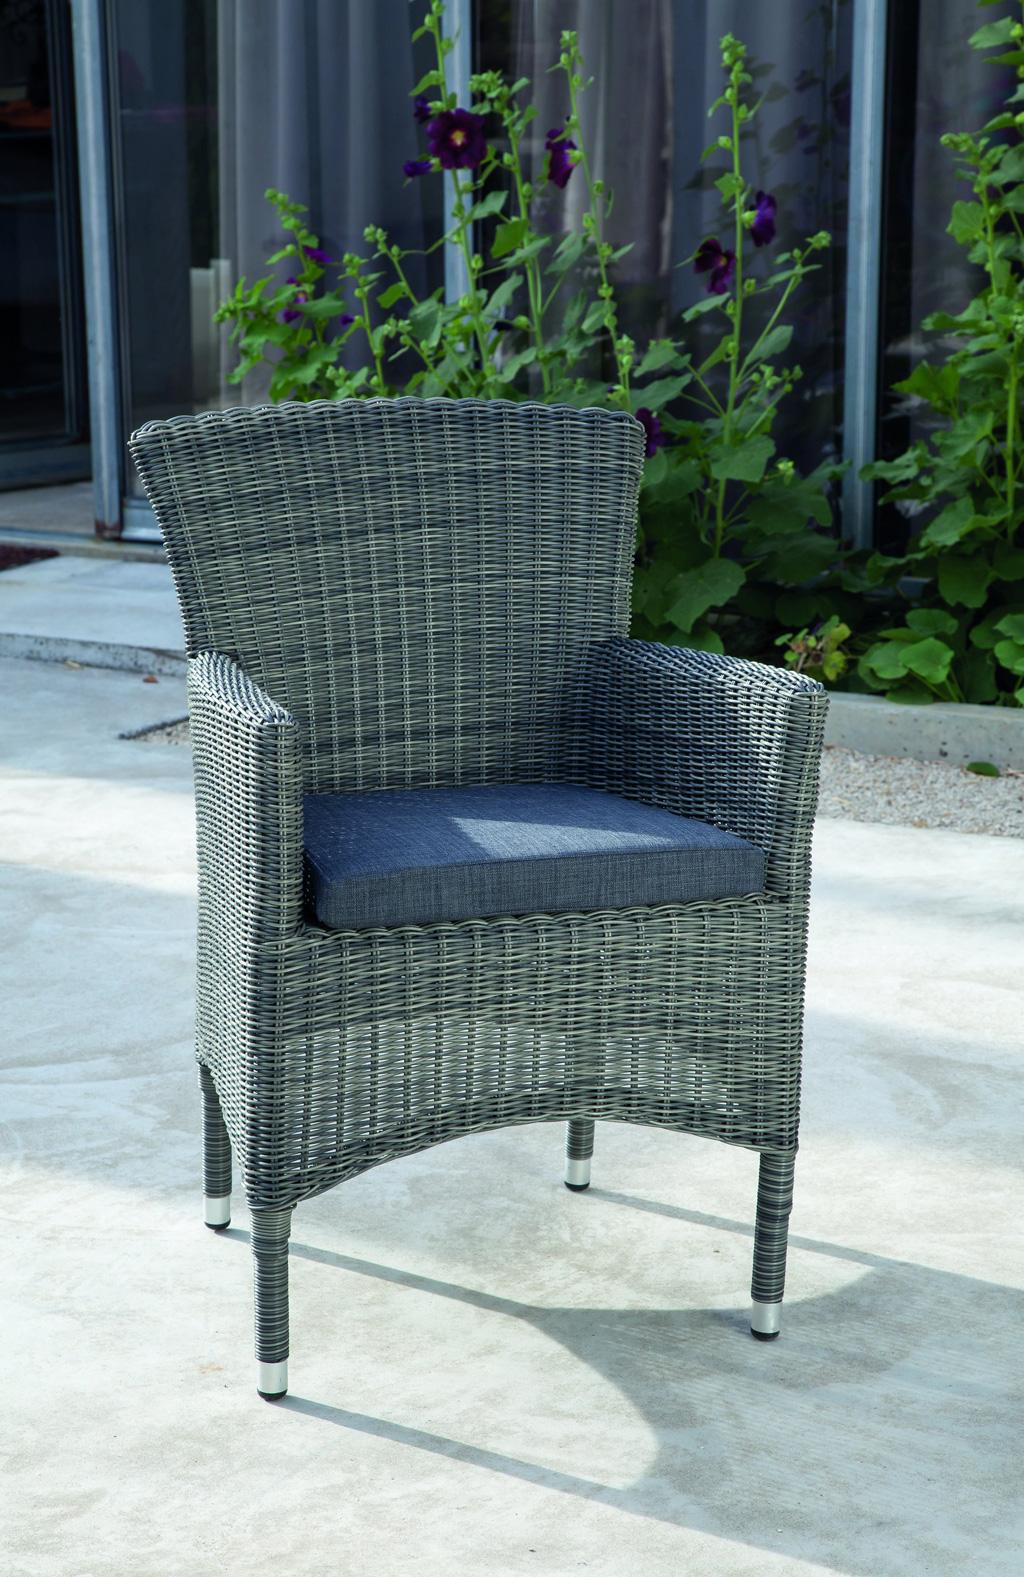 fauteuil lagune oc o sun mobilier. Black Bedroom Furniture Sets. Home Design Ideas